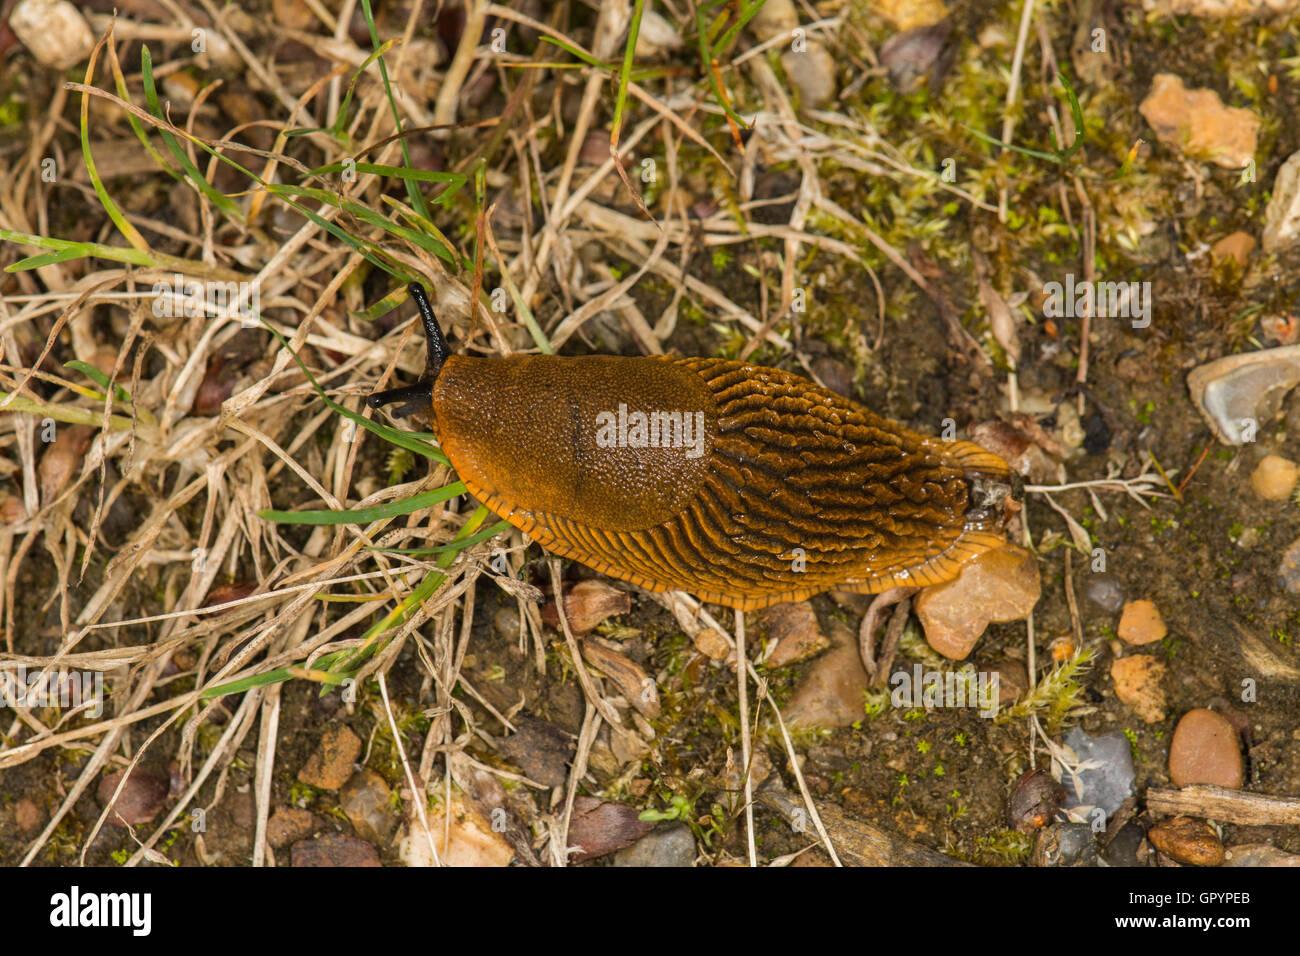 Arion vulgaris, or Spanish Slug on a woodland ride in North Norfolk. - Stock Image